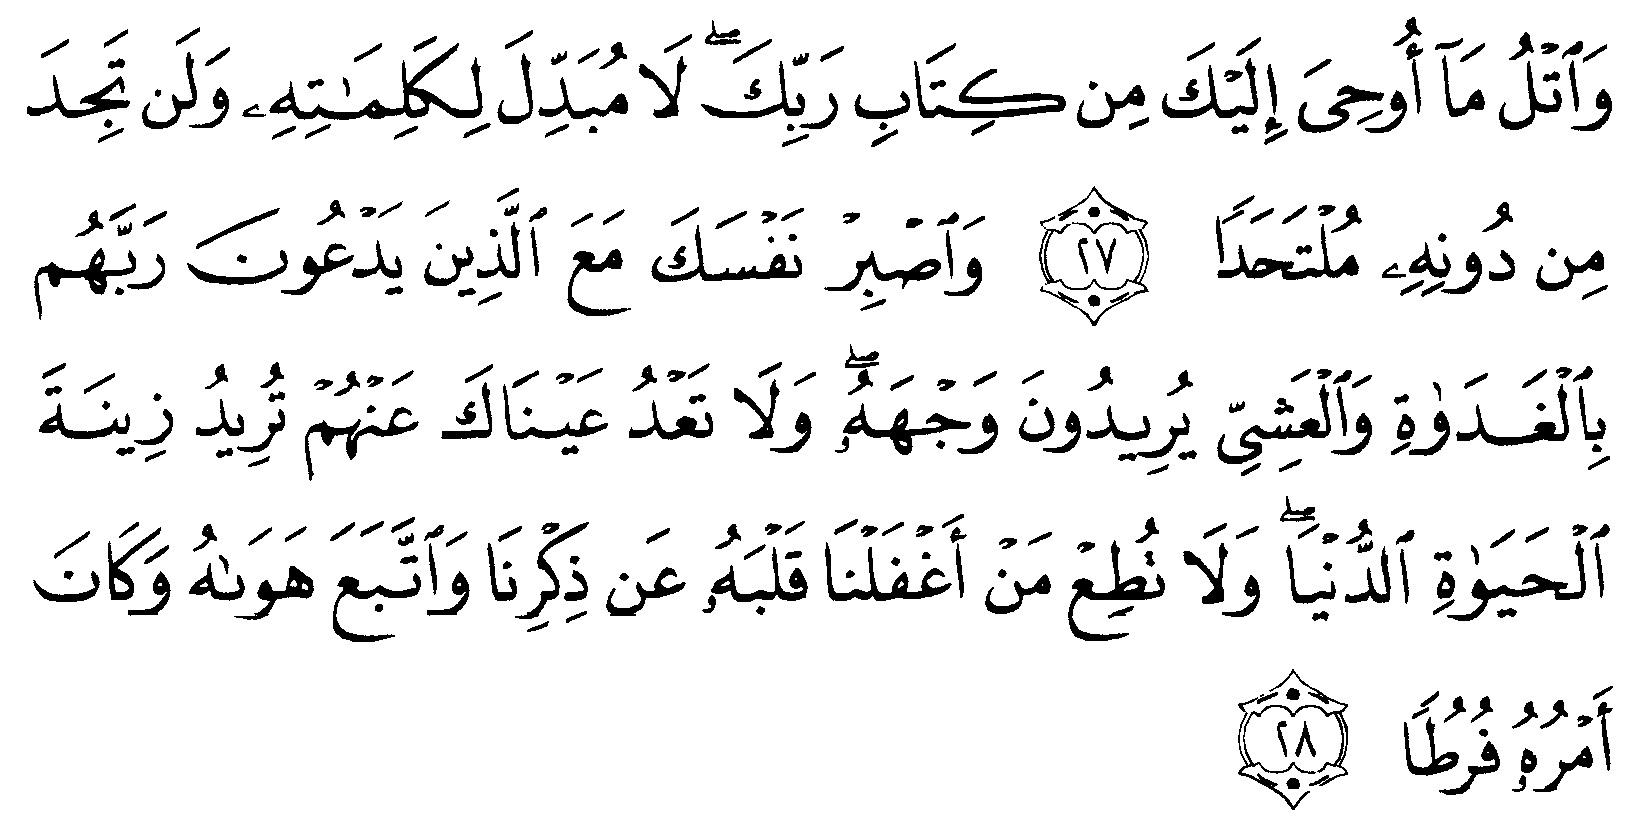 Tafsir Ibnu Katsir Surah Al Kahfi Ayat 27 28 Alquranmulia